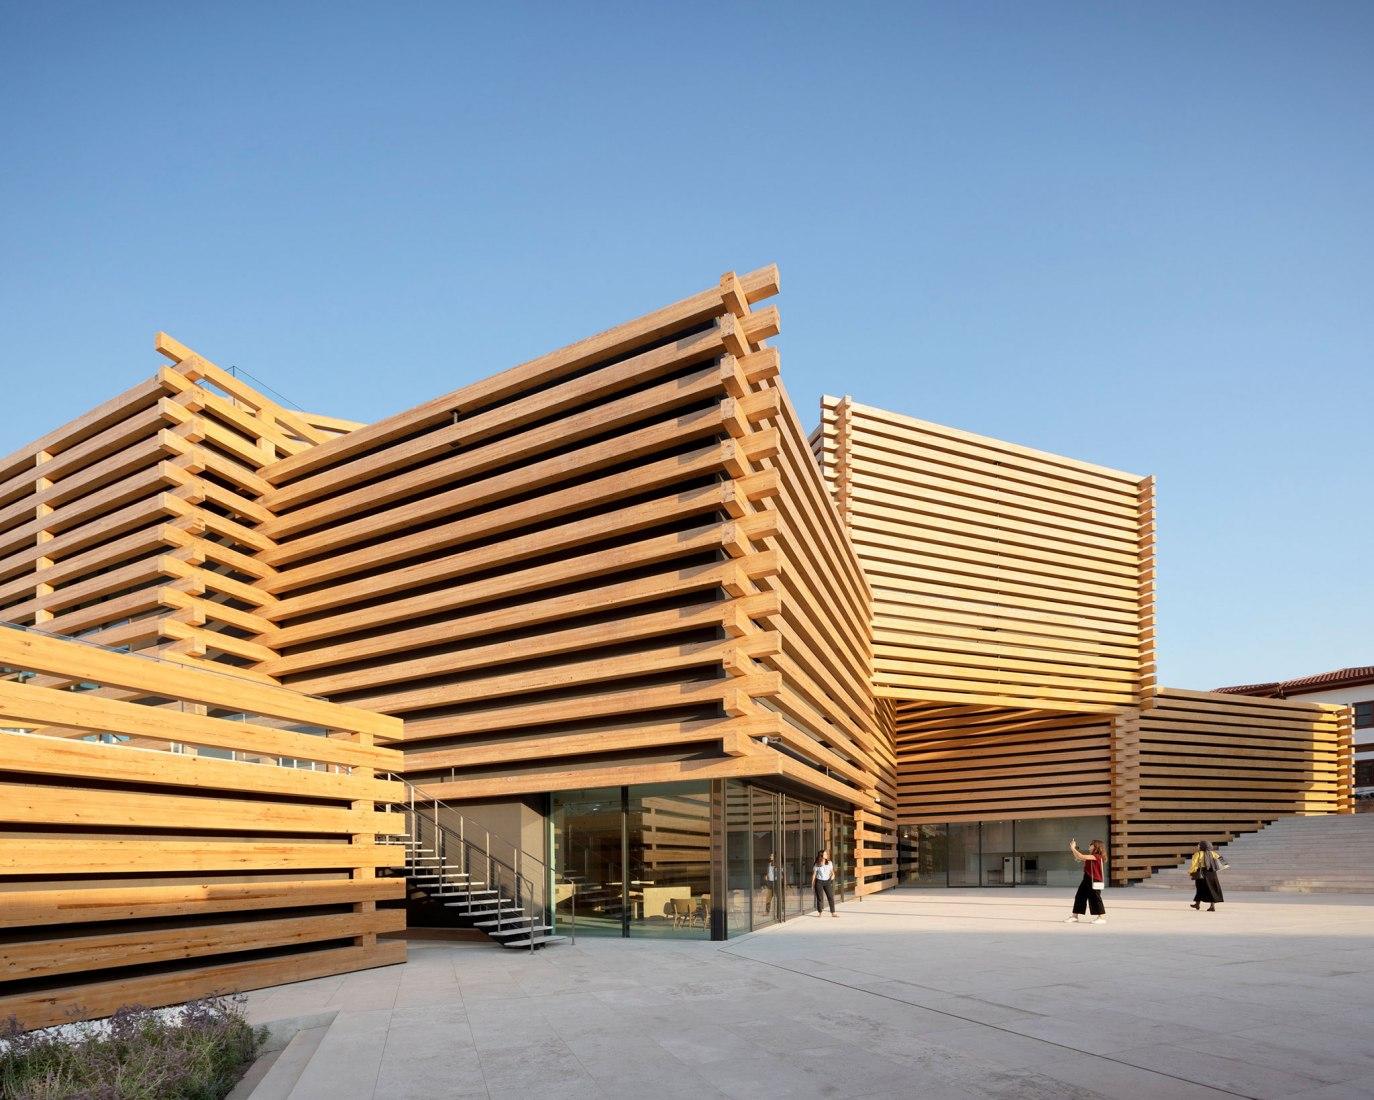 Odunpazarı Modern Museum by Kengo Kuma. Photograph by NAARO